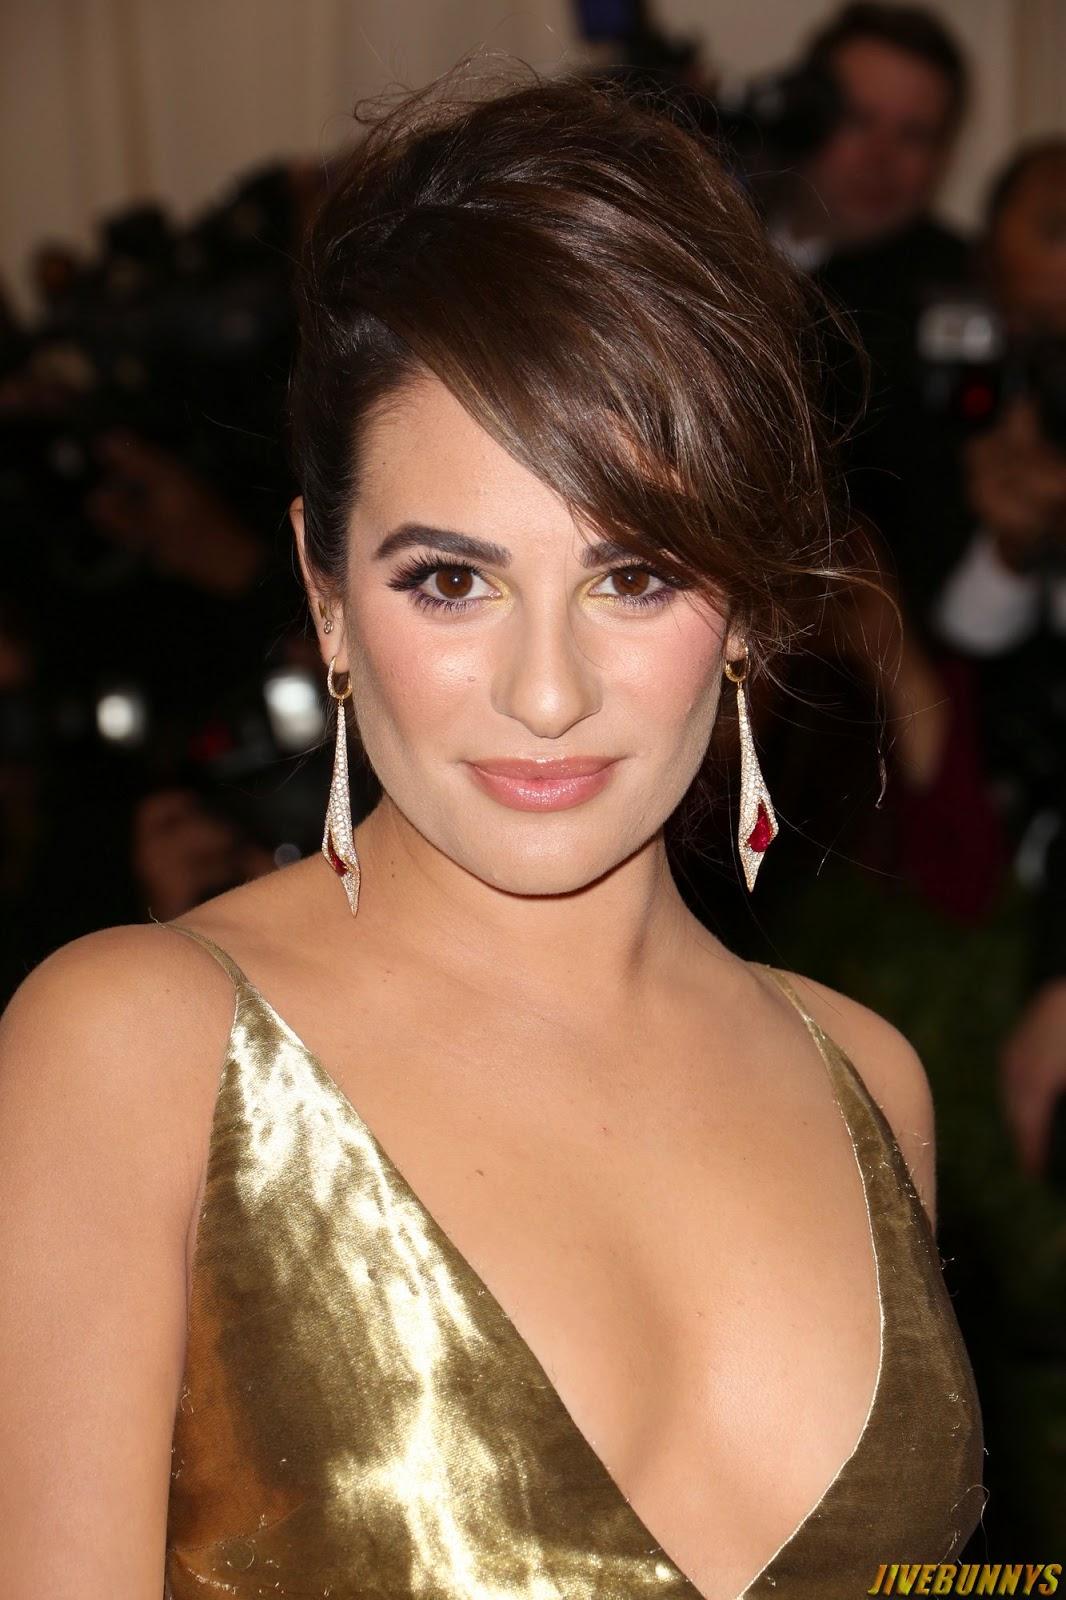 Jivebunnys Female Celebrity Picture Gallery: Lea Michele ... Jennifer Aniston Movies